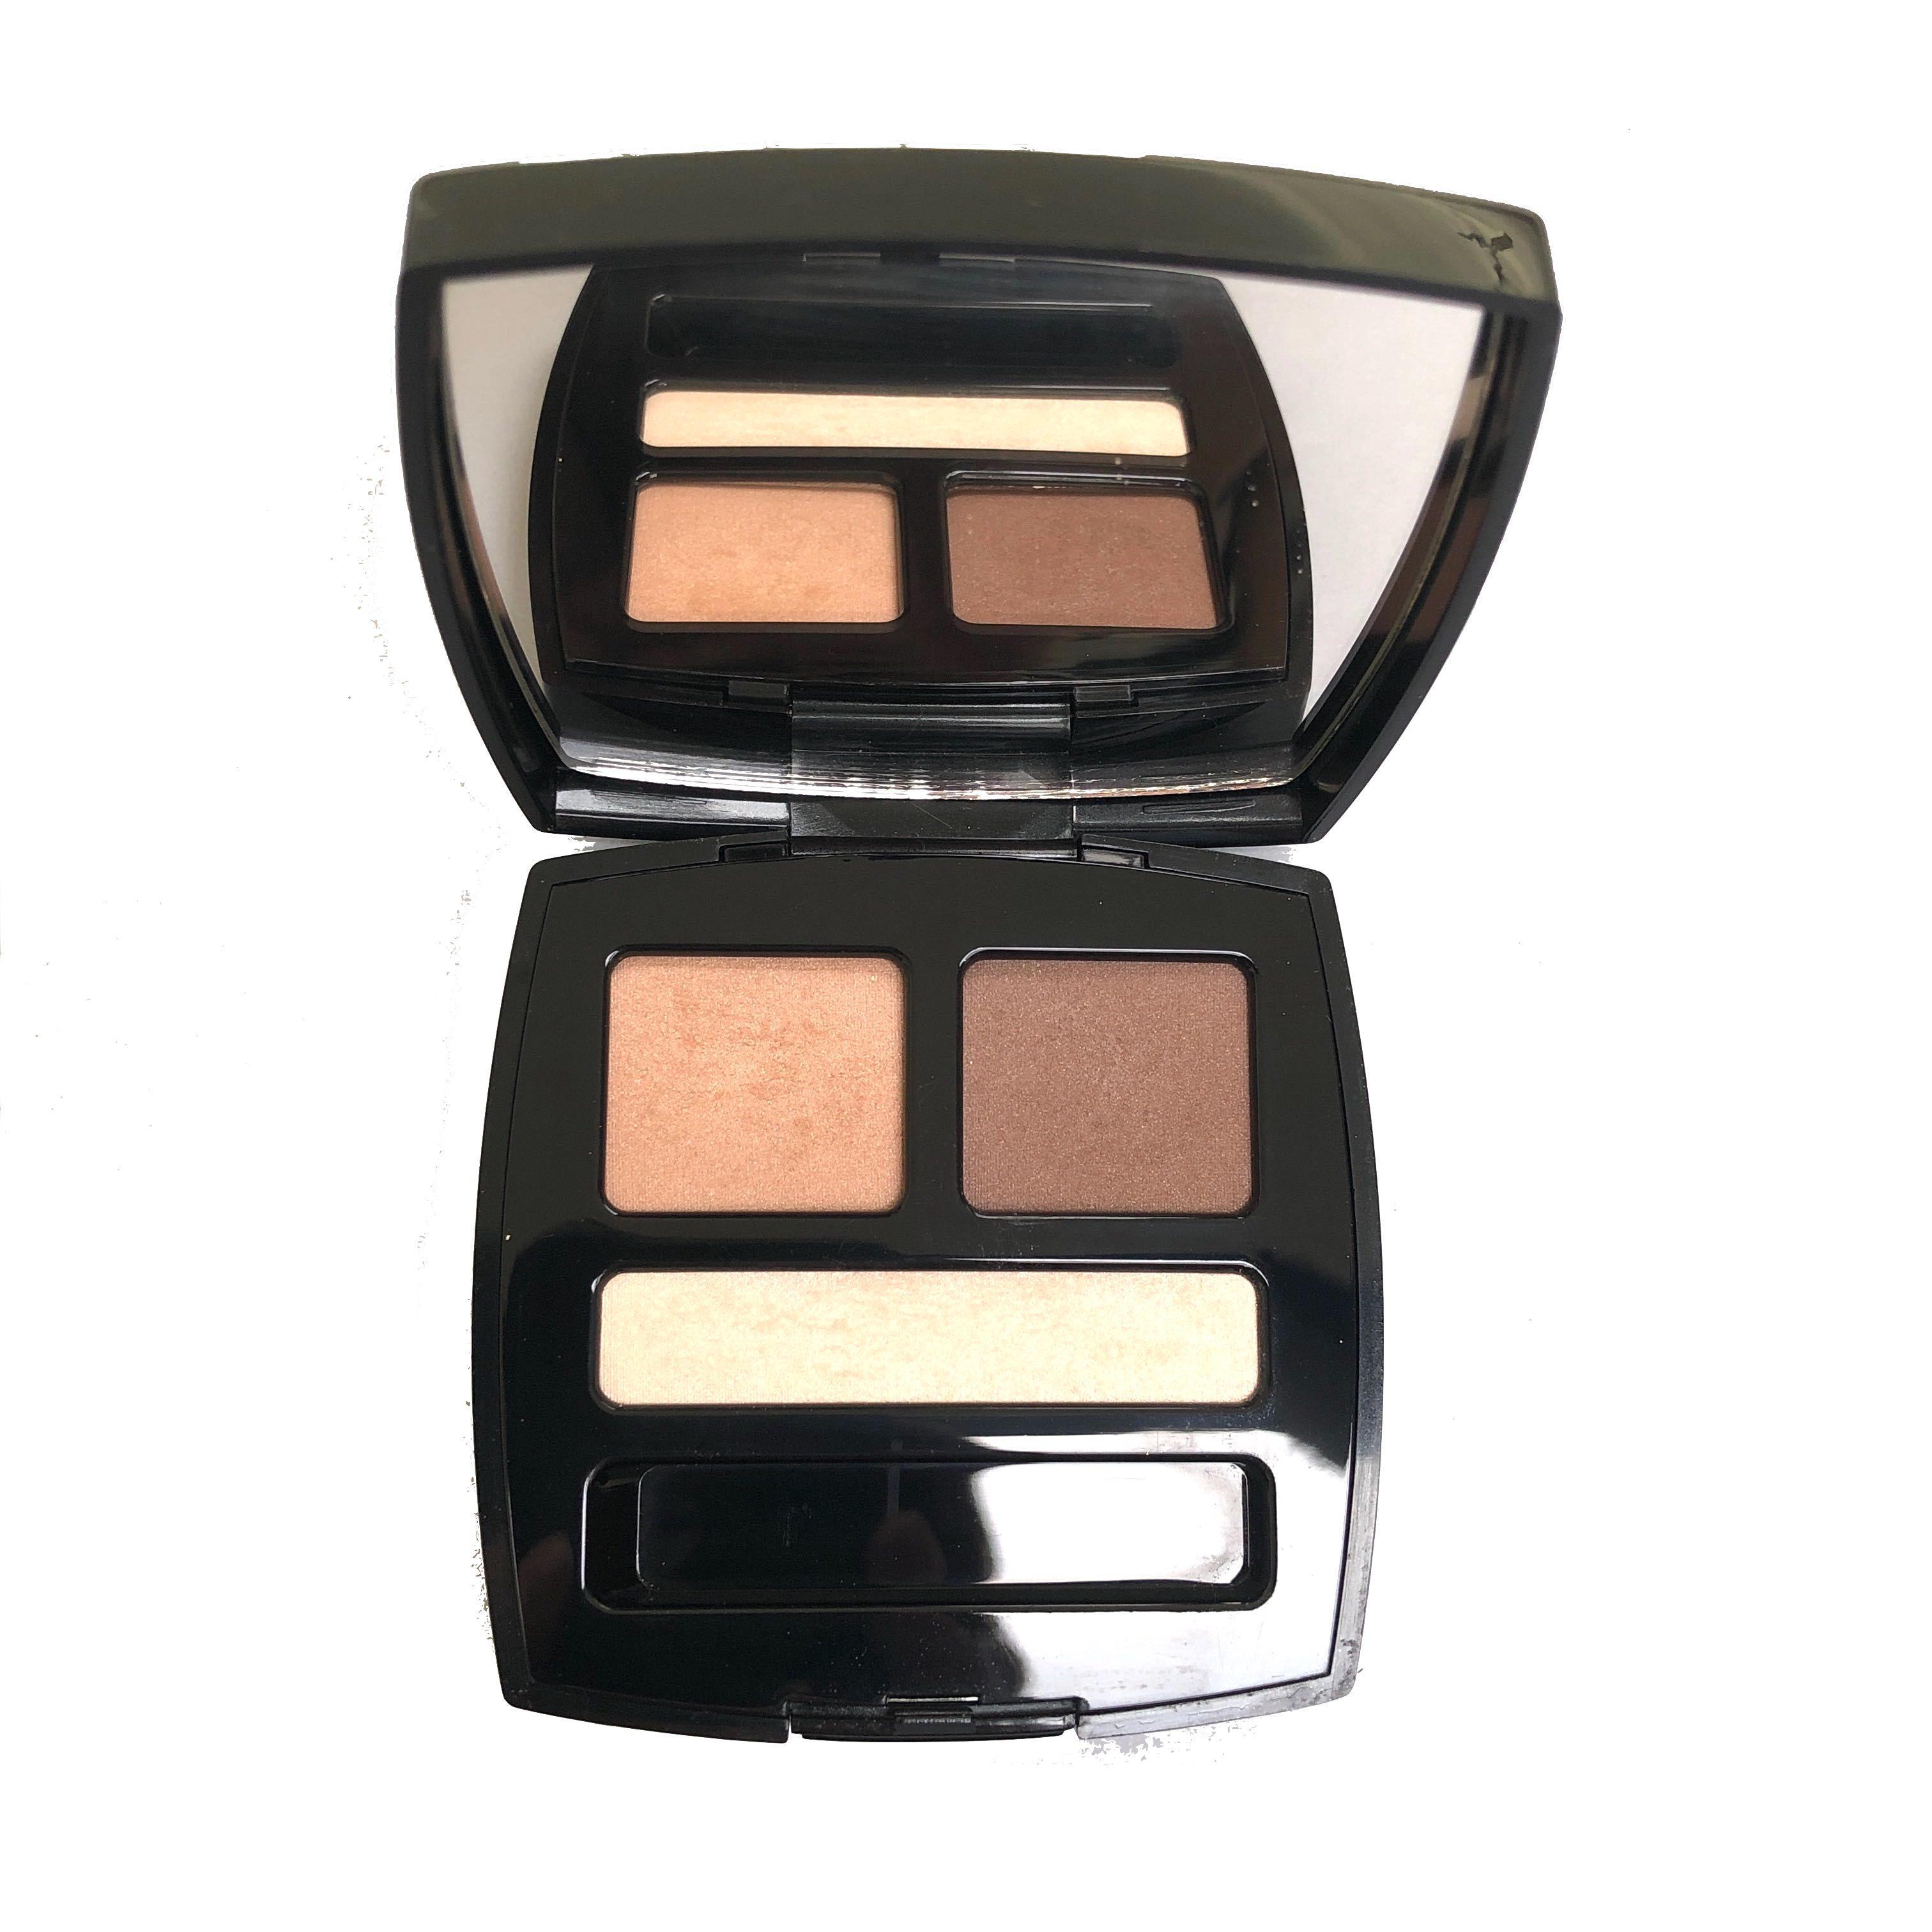 Chanel Basic Eye Colour Natures Sand/Cocoa/Bone